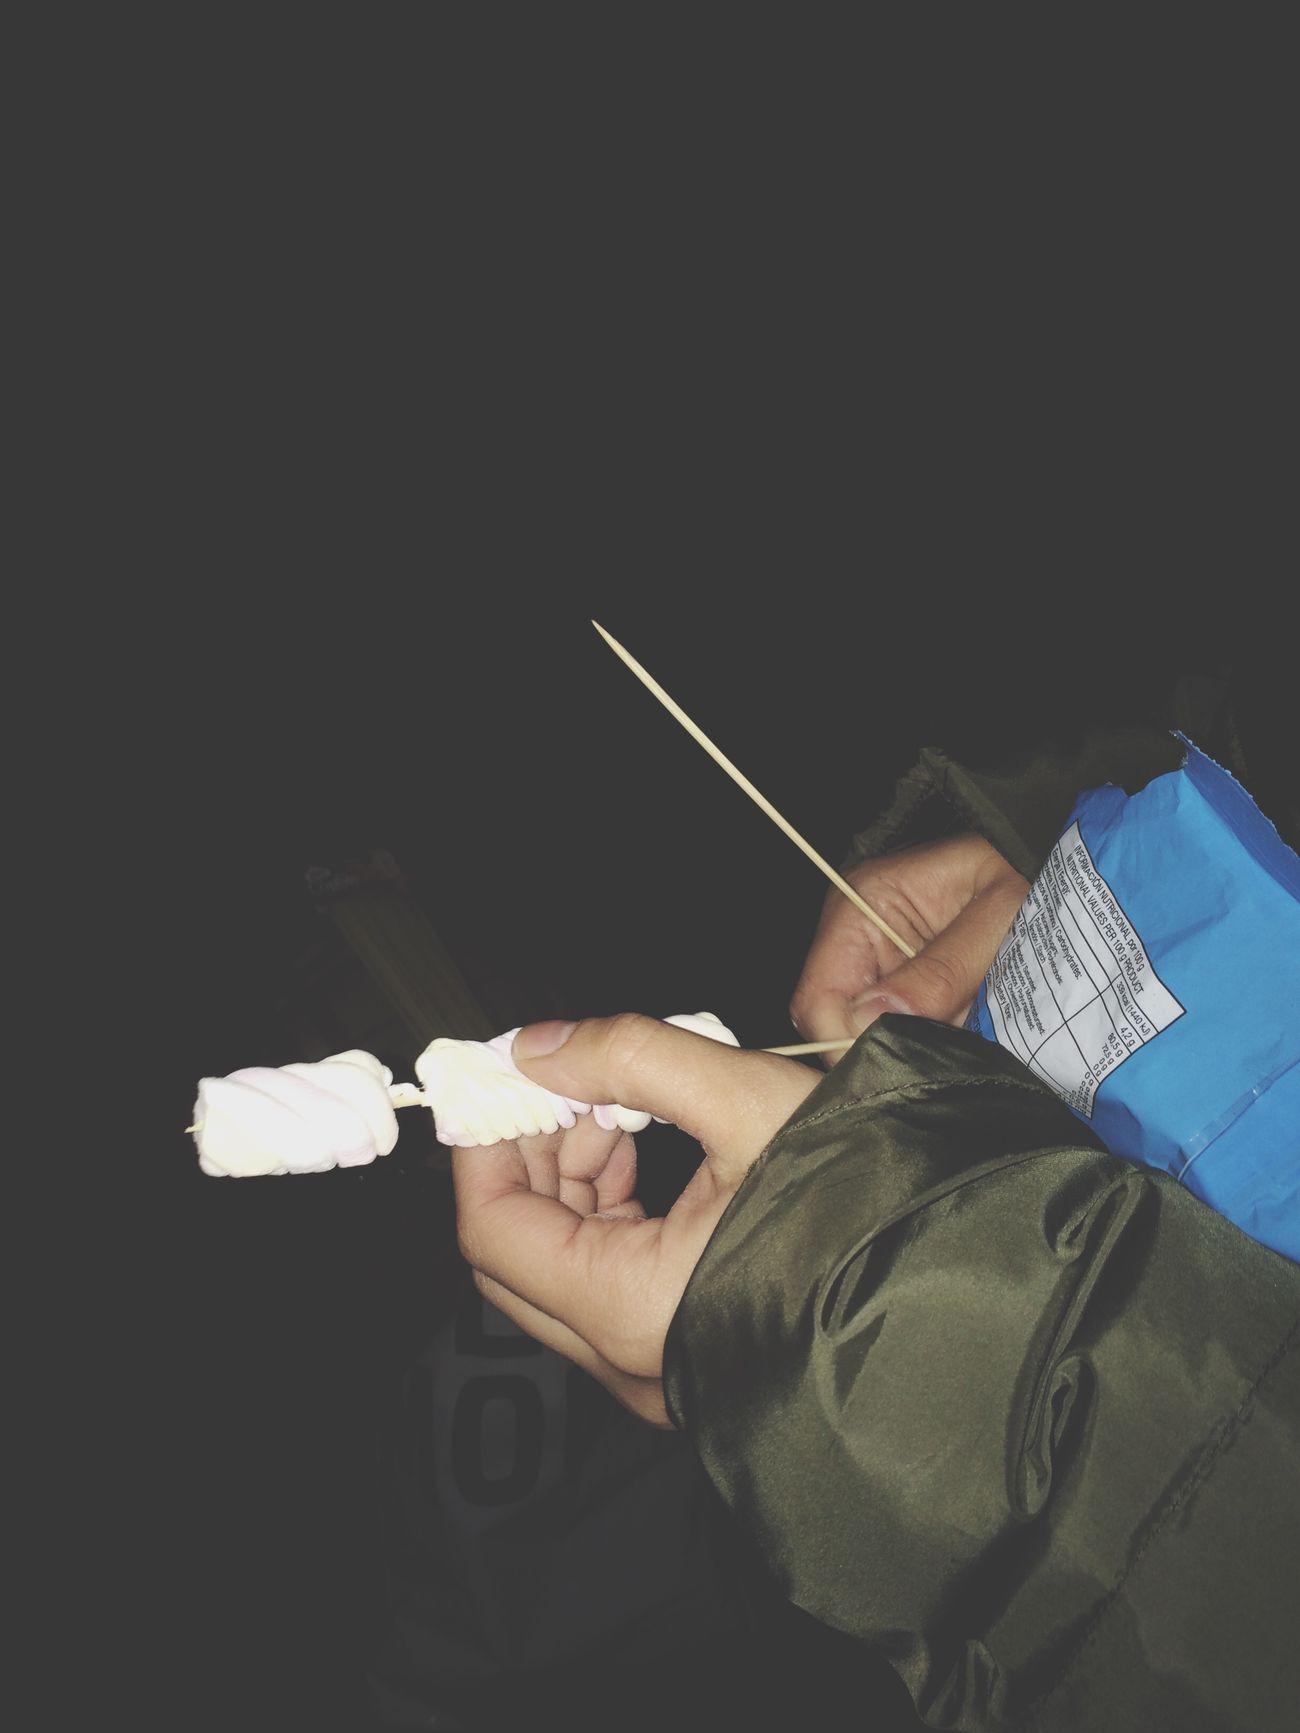 kebab Shish Kebabs Marshmallows Fire Youaremylove Gulumse